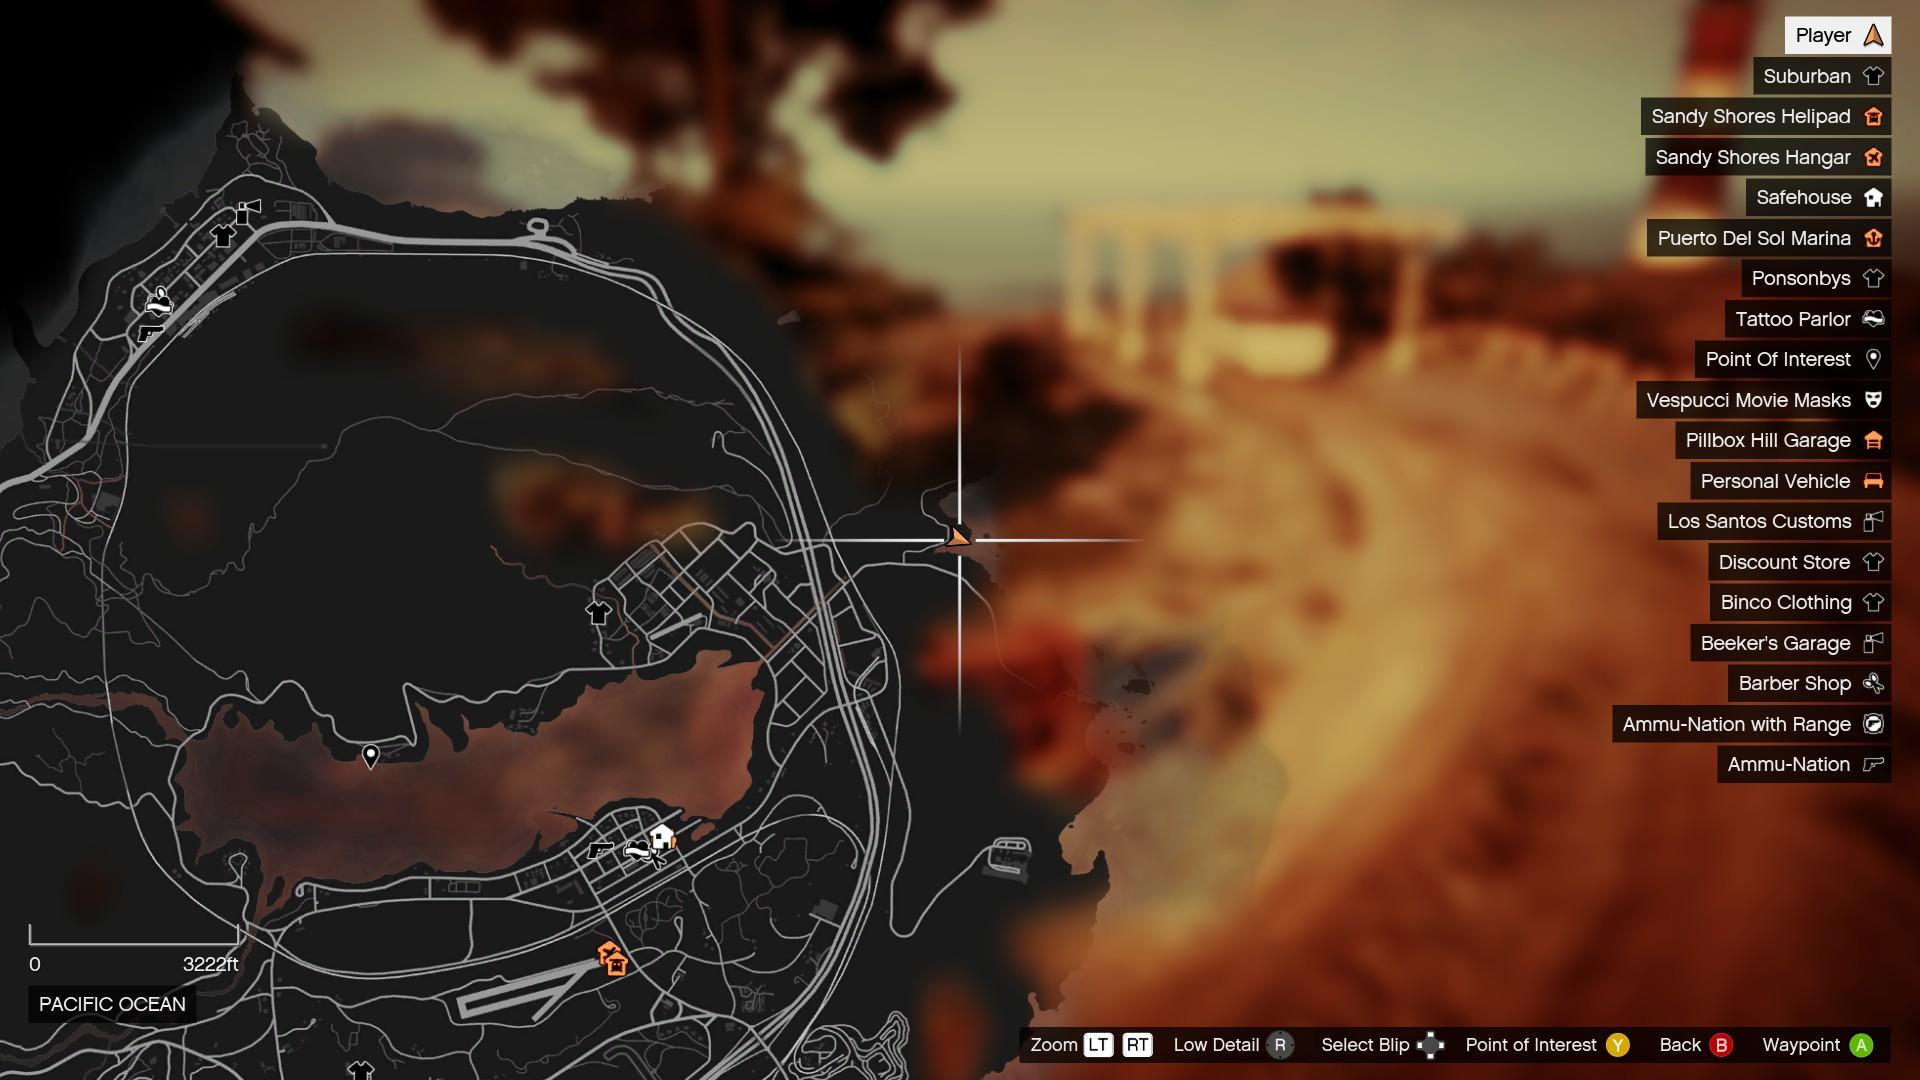 Steam Community :: Guide :: GTA 5 Ultimate Guide (Stock